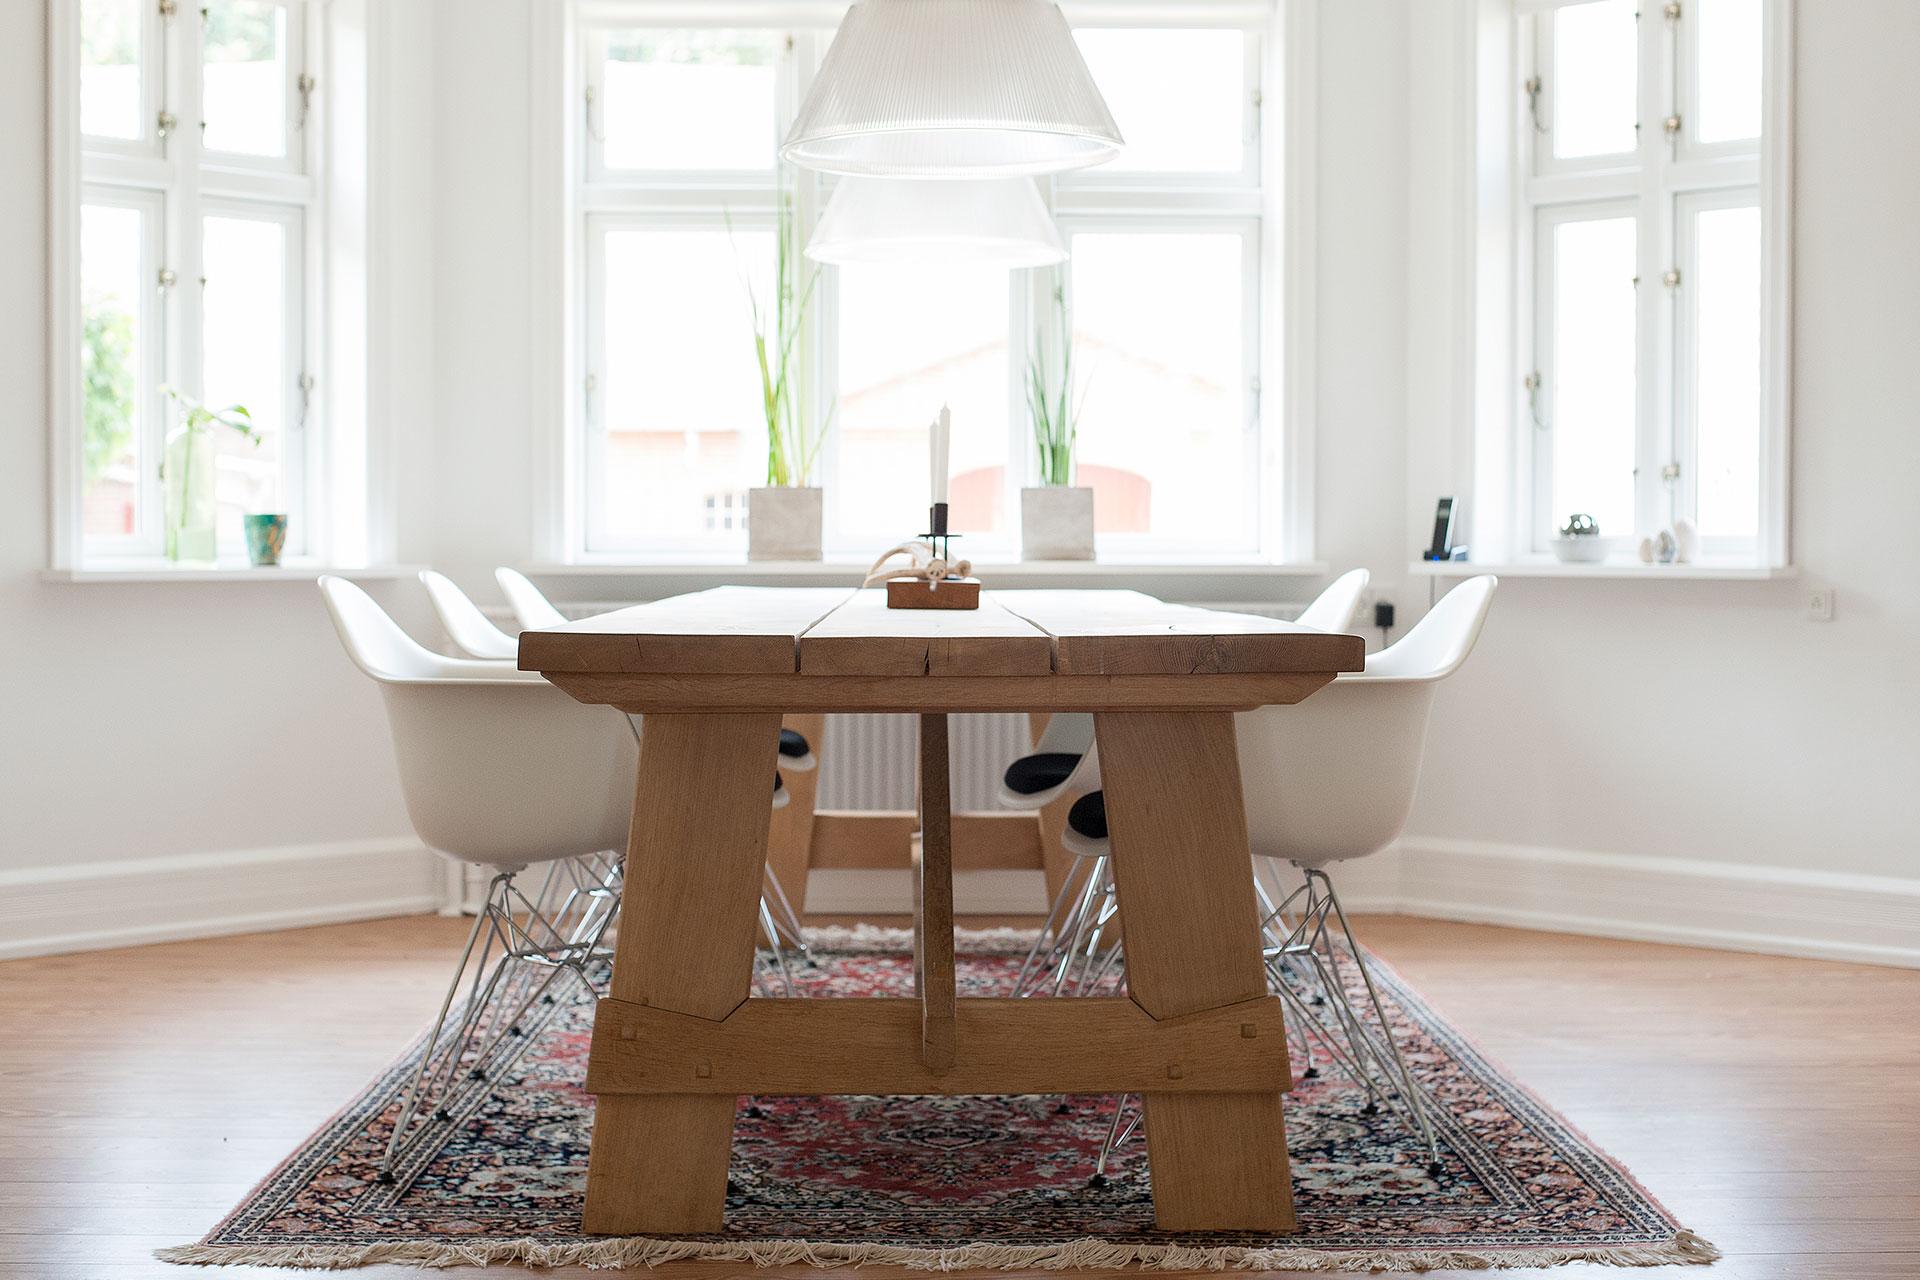 Det første Fat Tables bord